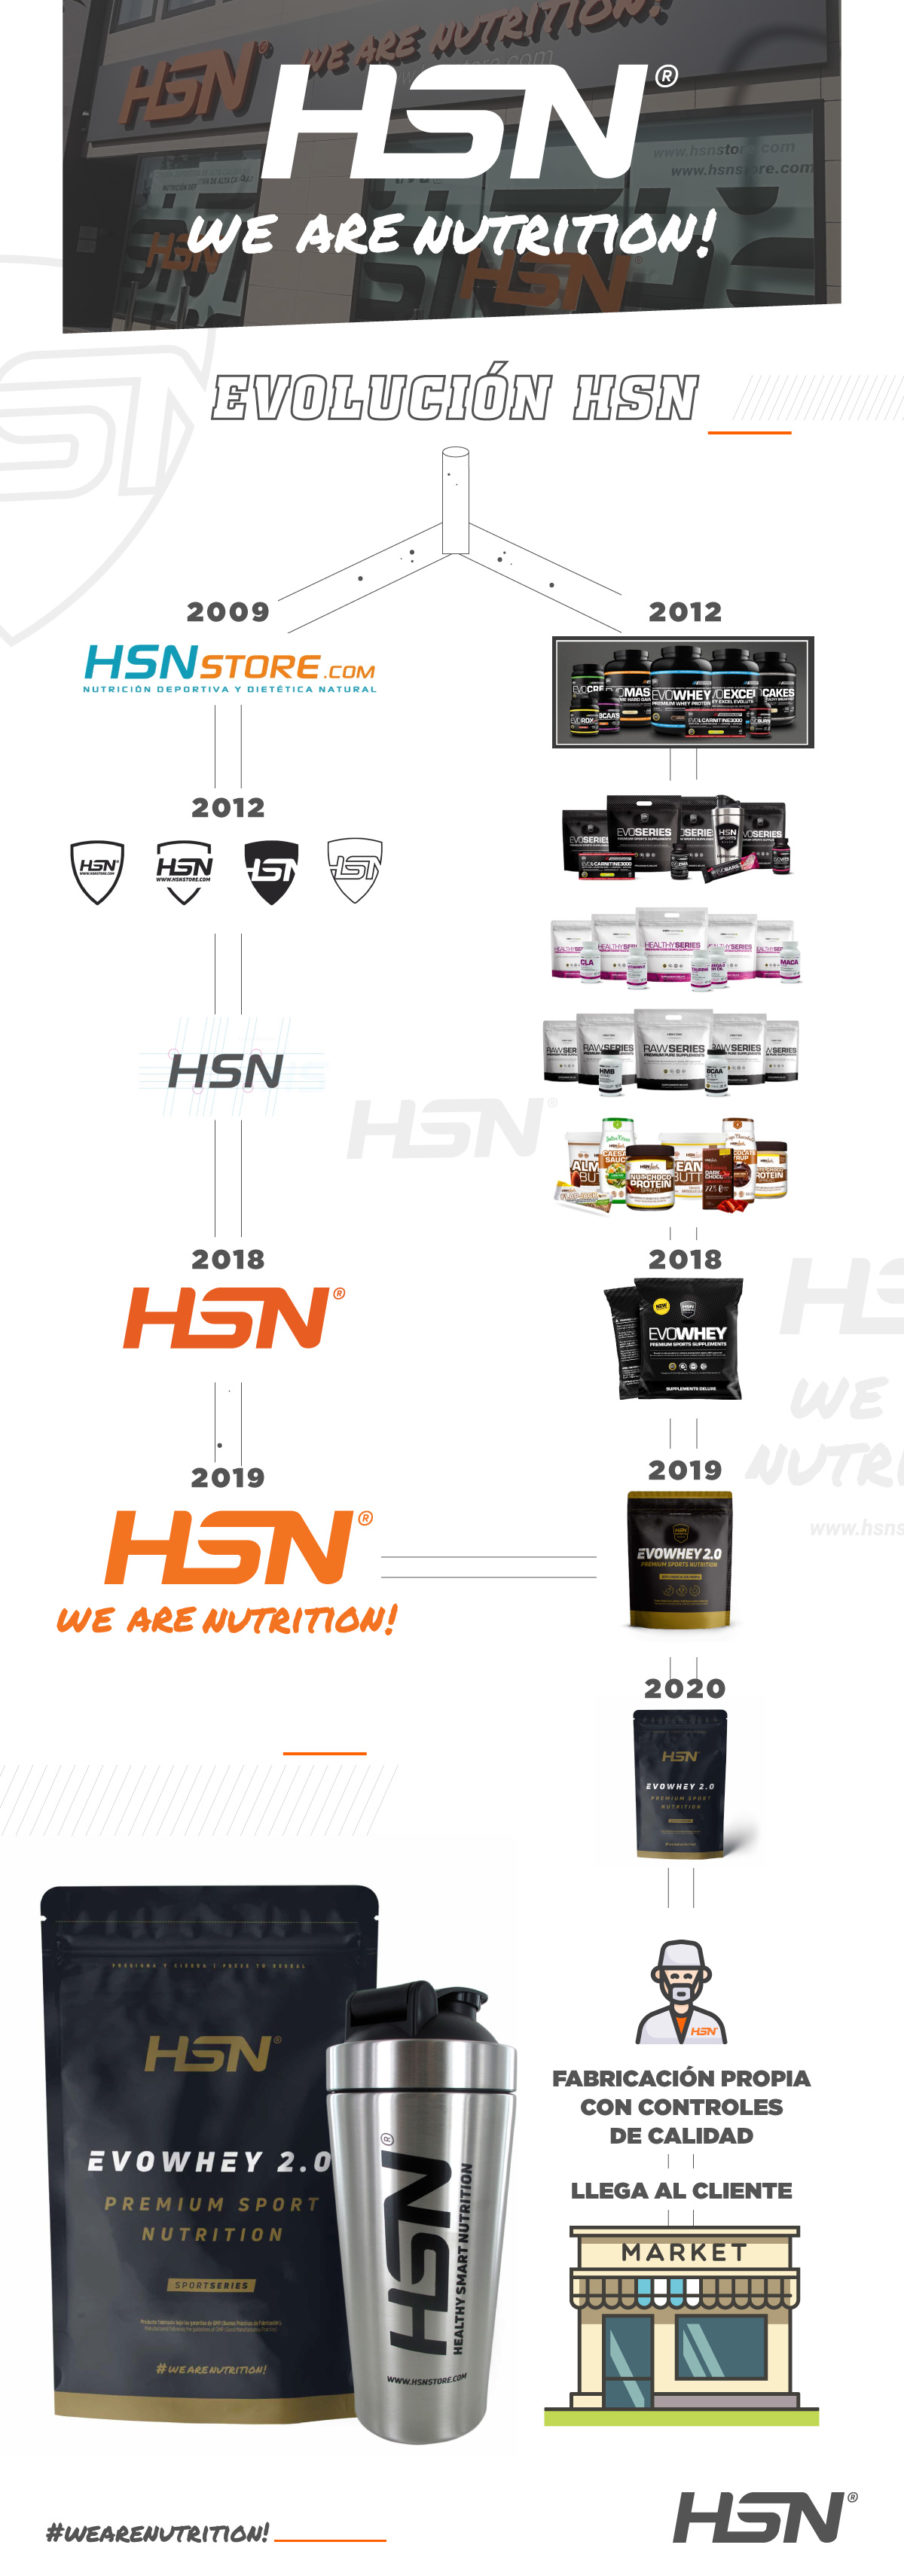 L'évolution du HSN